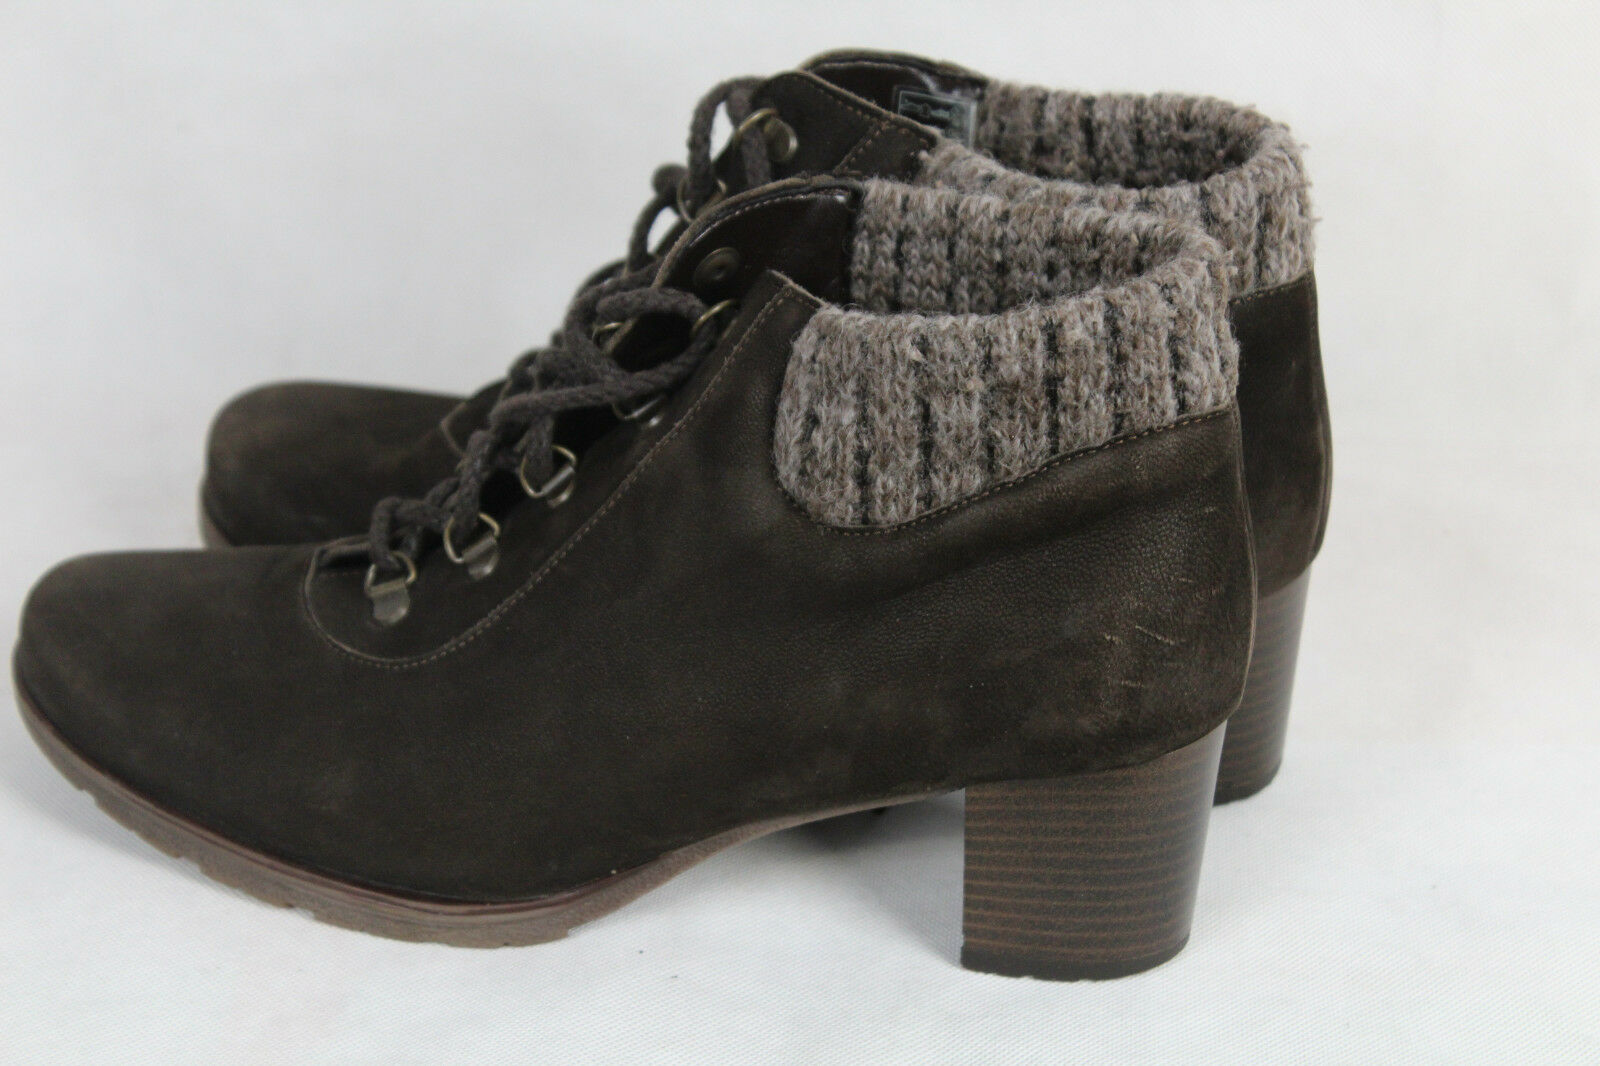 Ara Luftpolster Schuhe guter Stiefeletten Gr.42 (8),sehr guter Schuhe Zustand 85b802